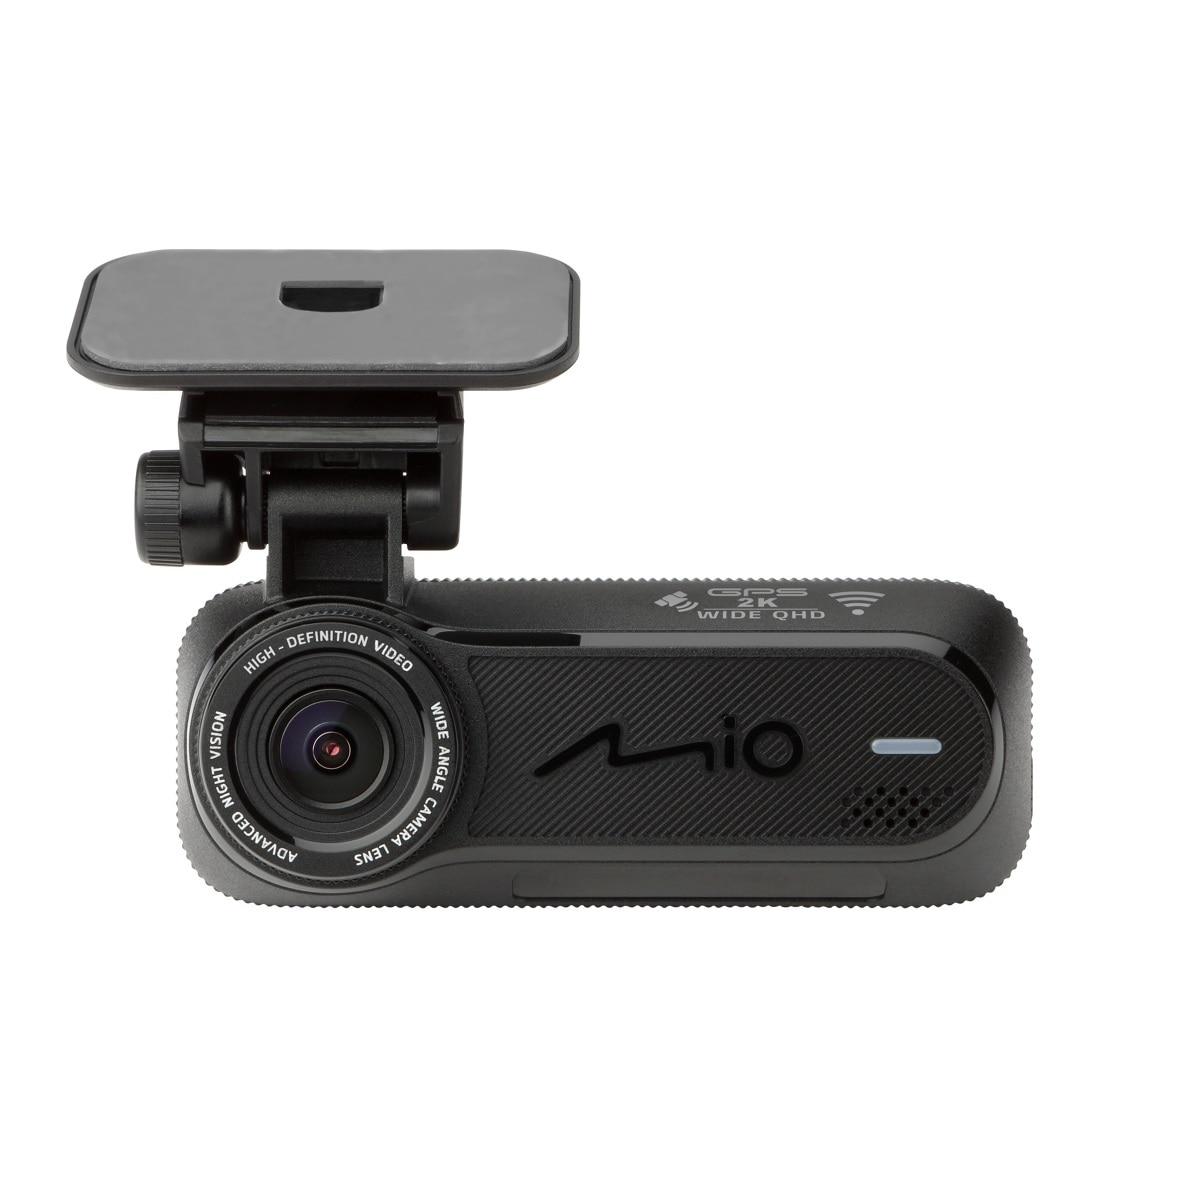 Fotografie Camera auto DVR Mio MiVueJ85, QHD, unghi de 150 grade, WIFI, GPS, senzor G cu 3 axe, Negru